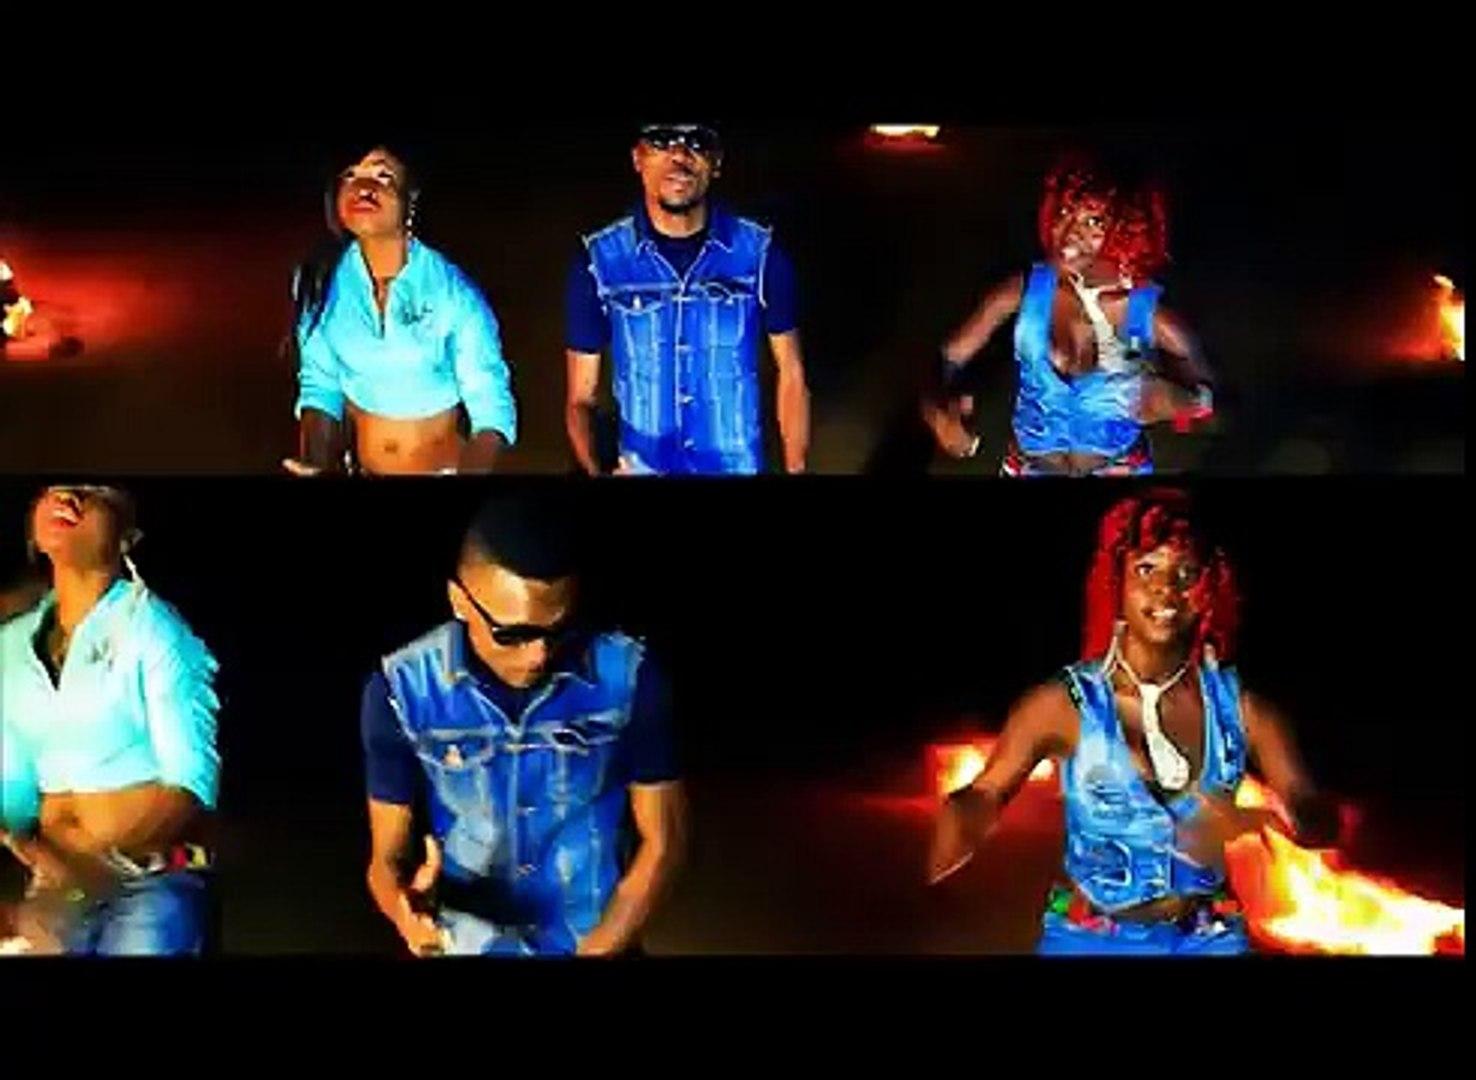 Serge Beynaud - Loko Loko (Clip Officiel) - Nigerian music